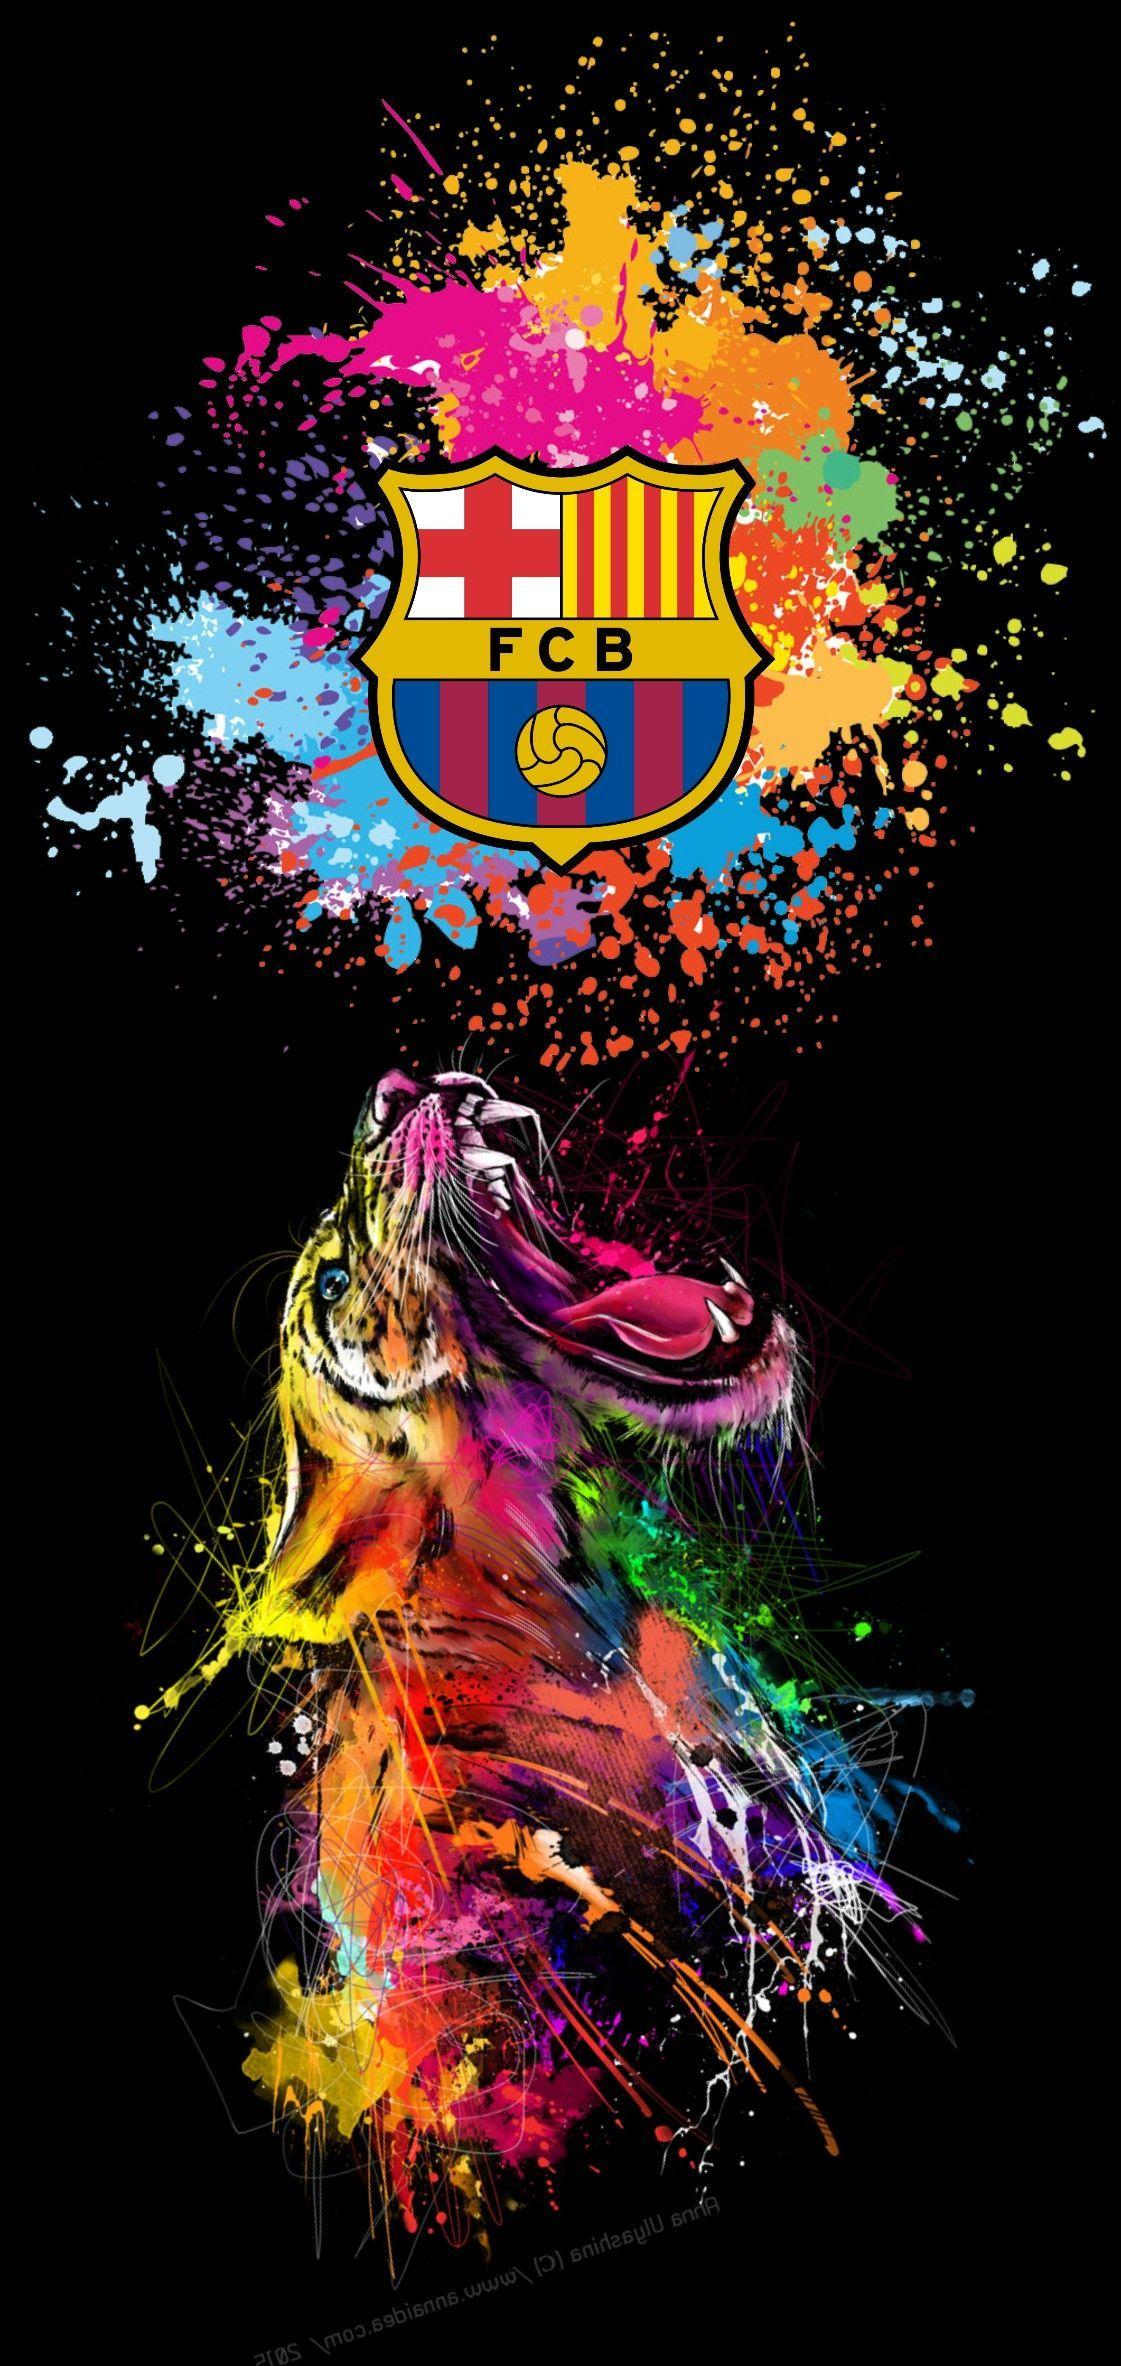 Epingle Par Gilarmando Sur J Adore Football Barcelone Photo De Cristiano Ronaldo Fond D Ecran Barcelone